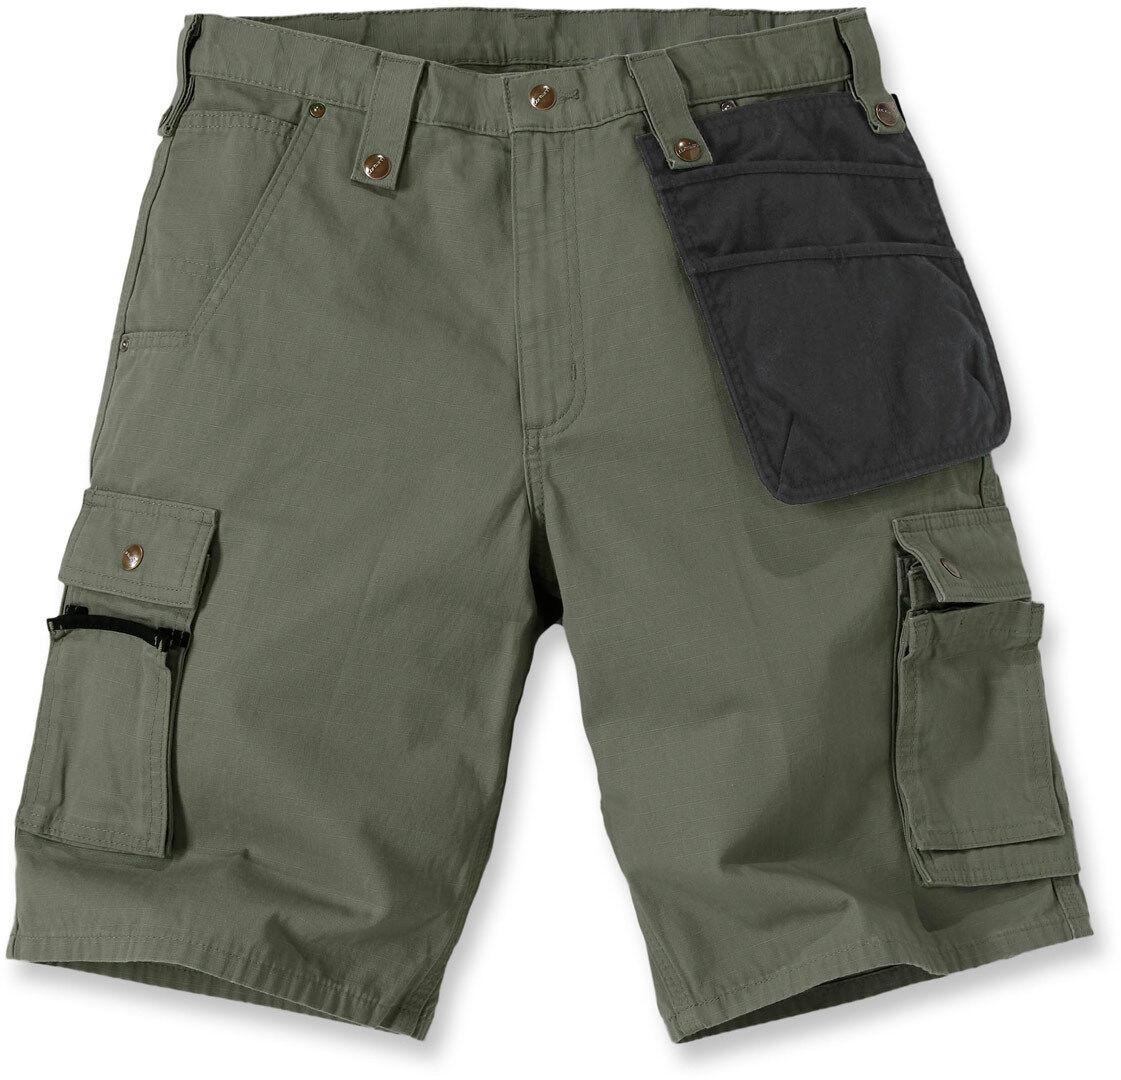 Carhartt Multi Pocket Ripstop Pantalones cortos Verde 42